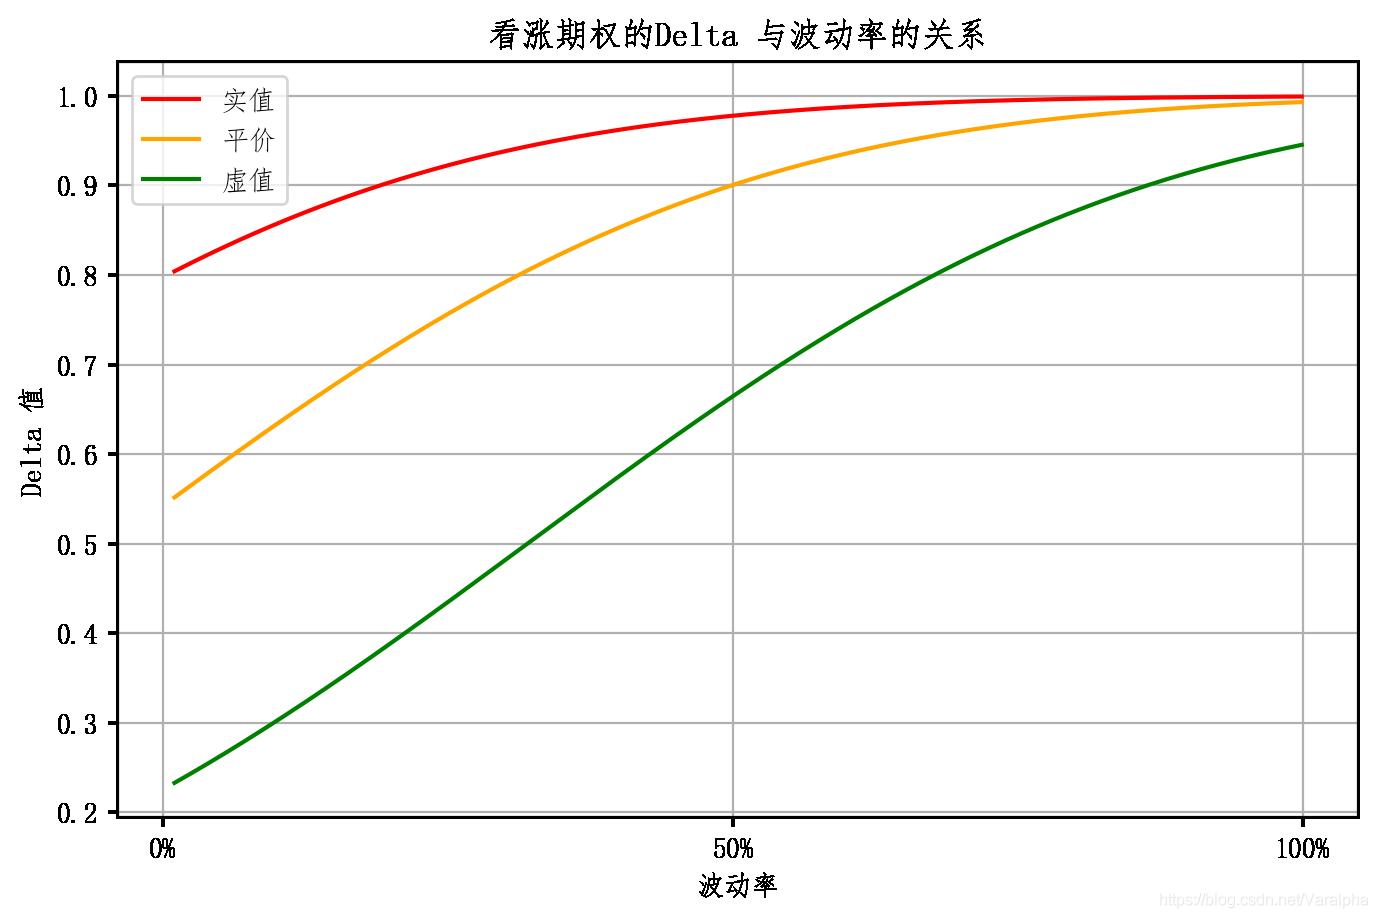 Delta 看涨 与波动率